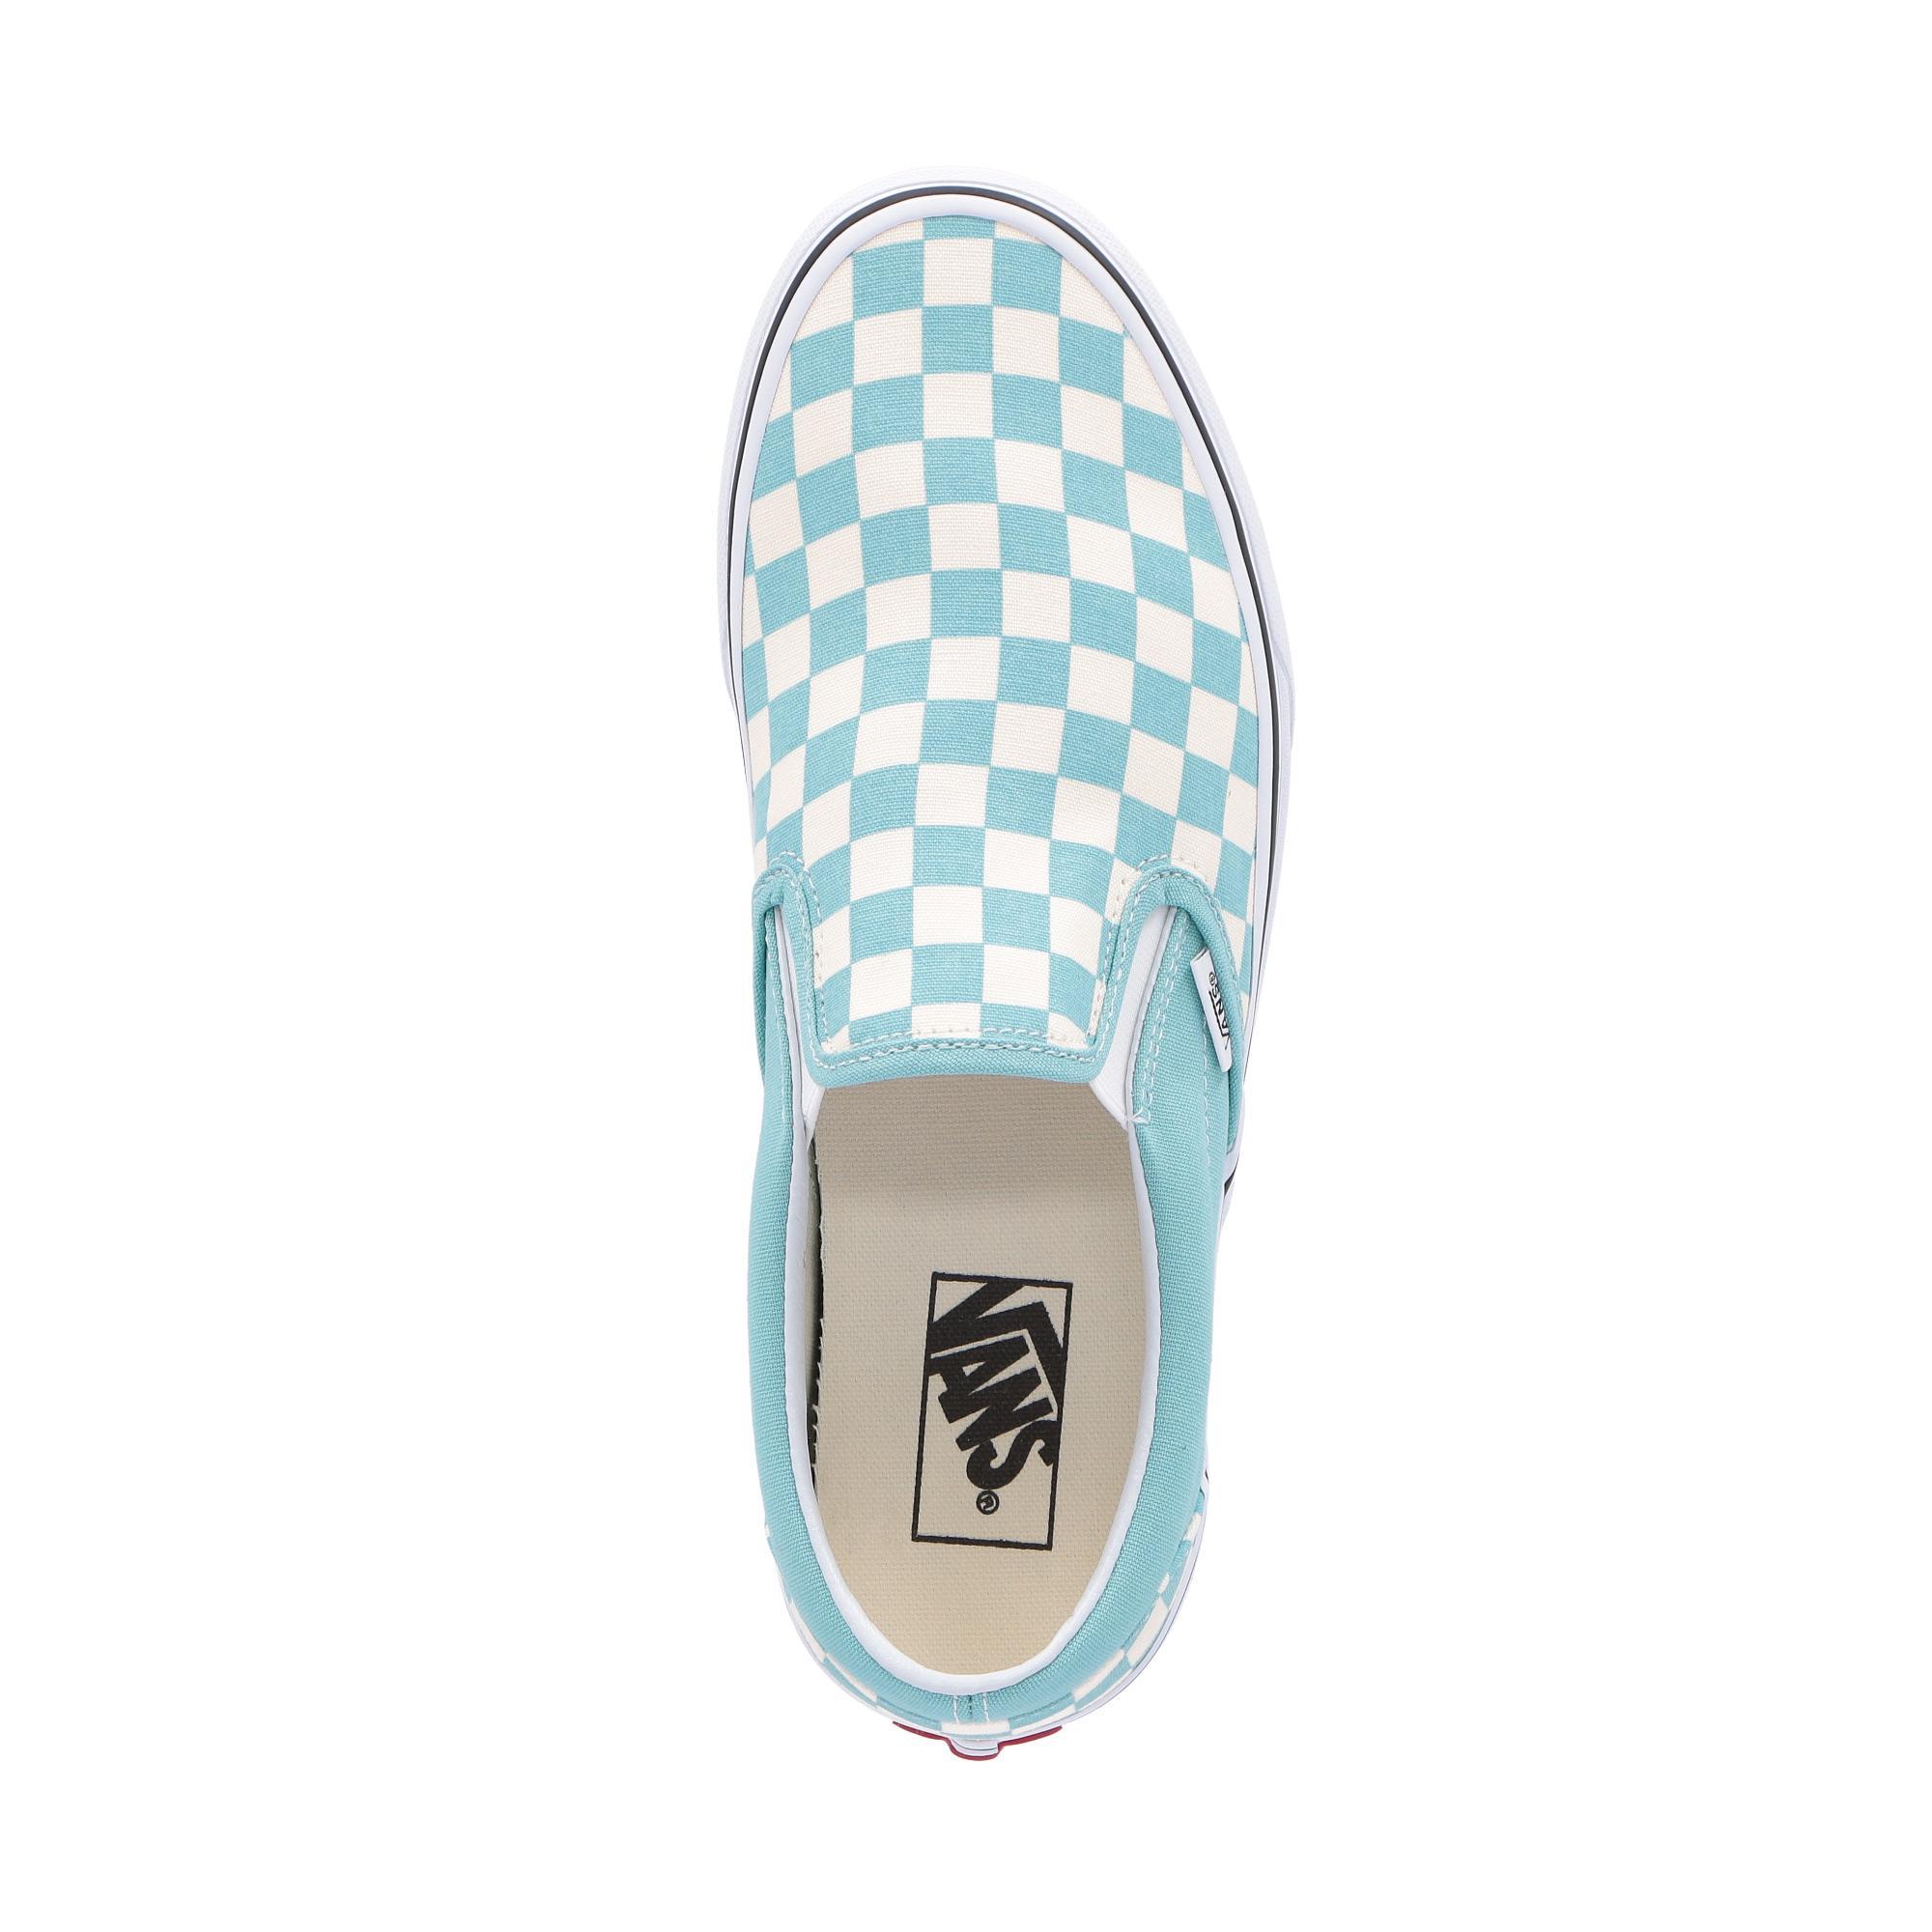 Vans Classic Slip-on (checkerboard) aqua haze